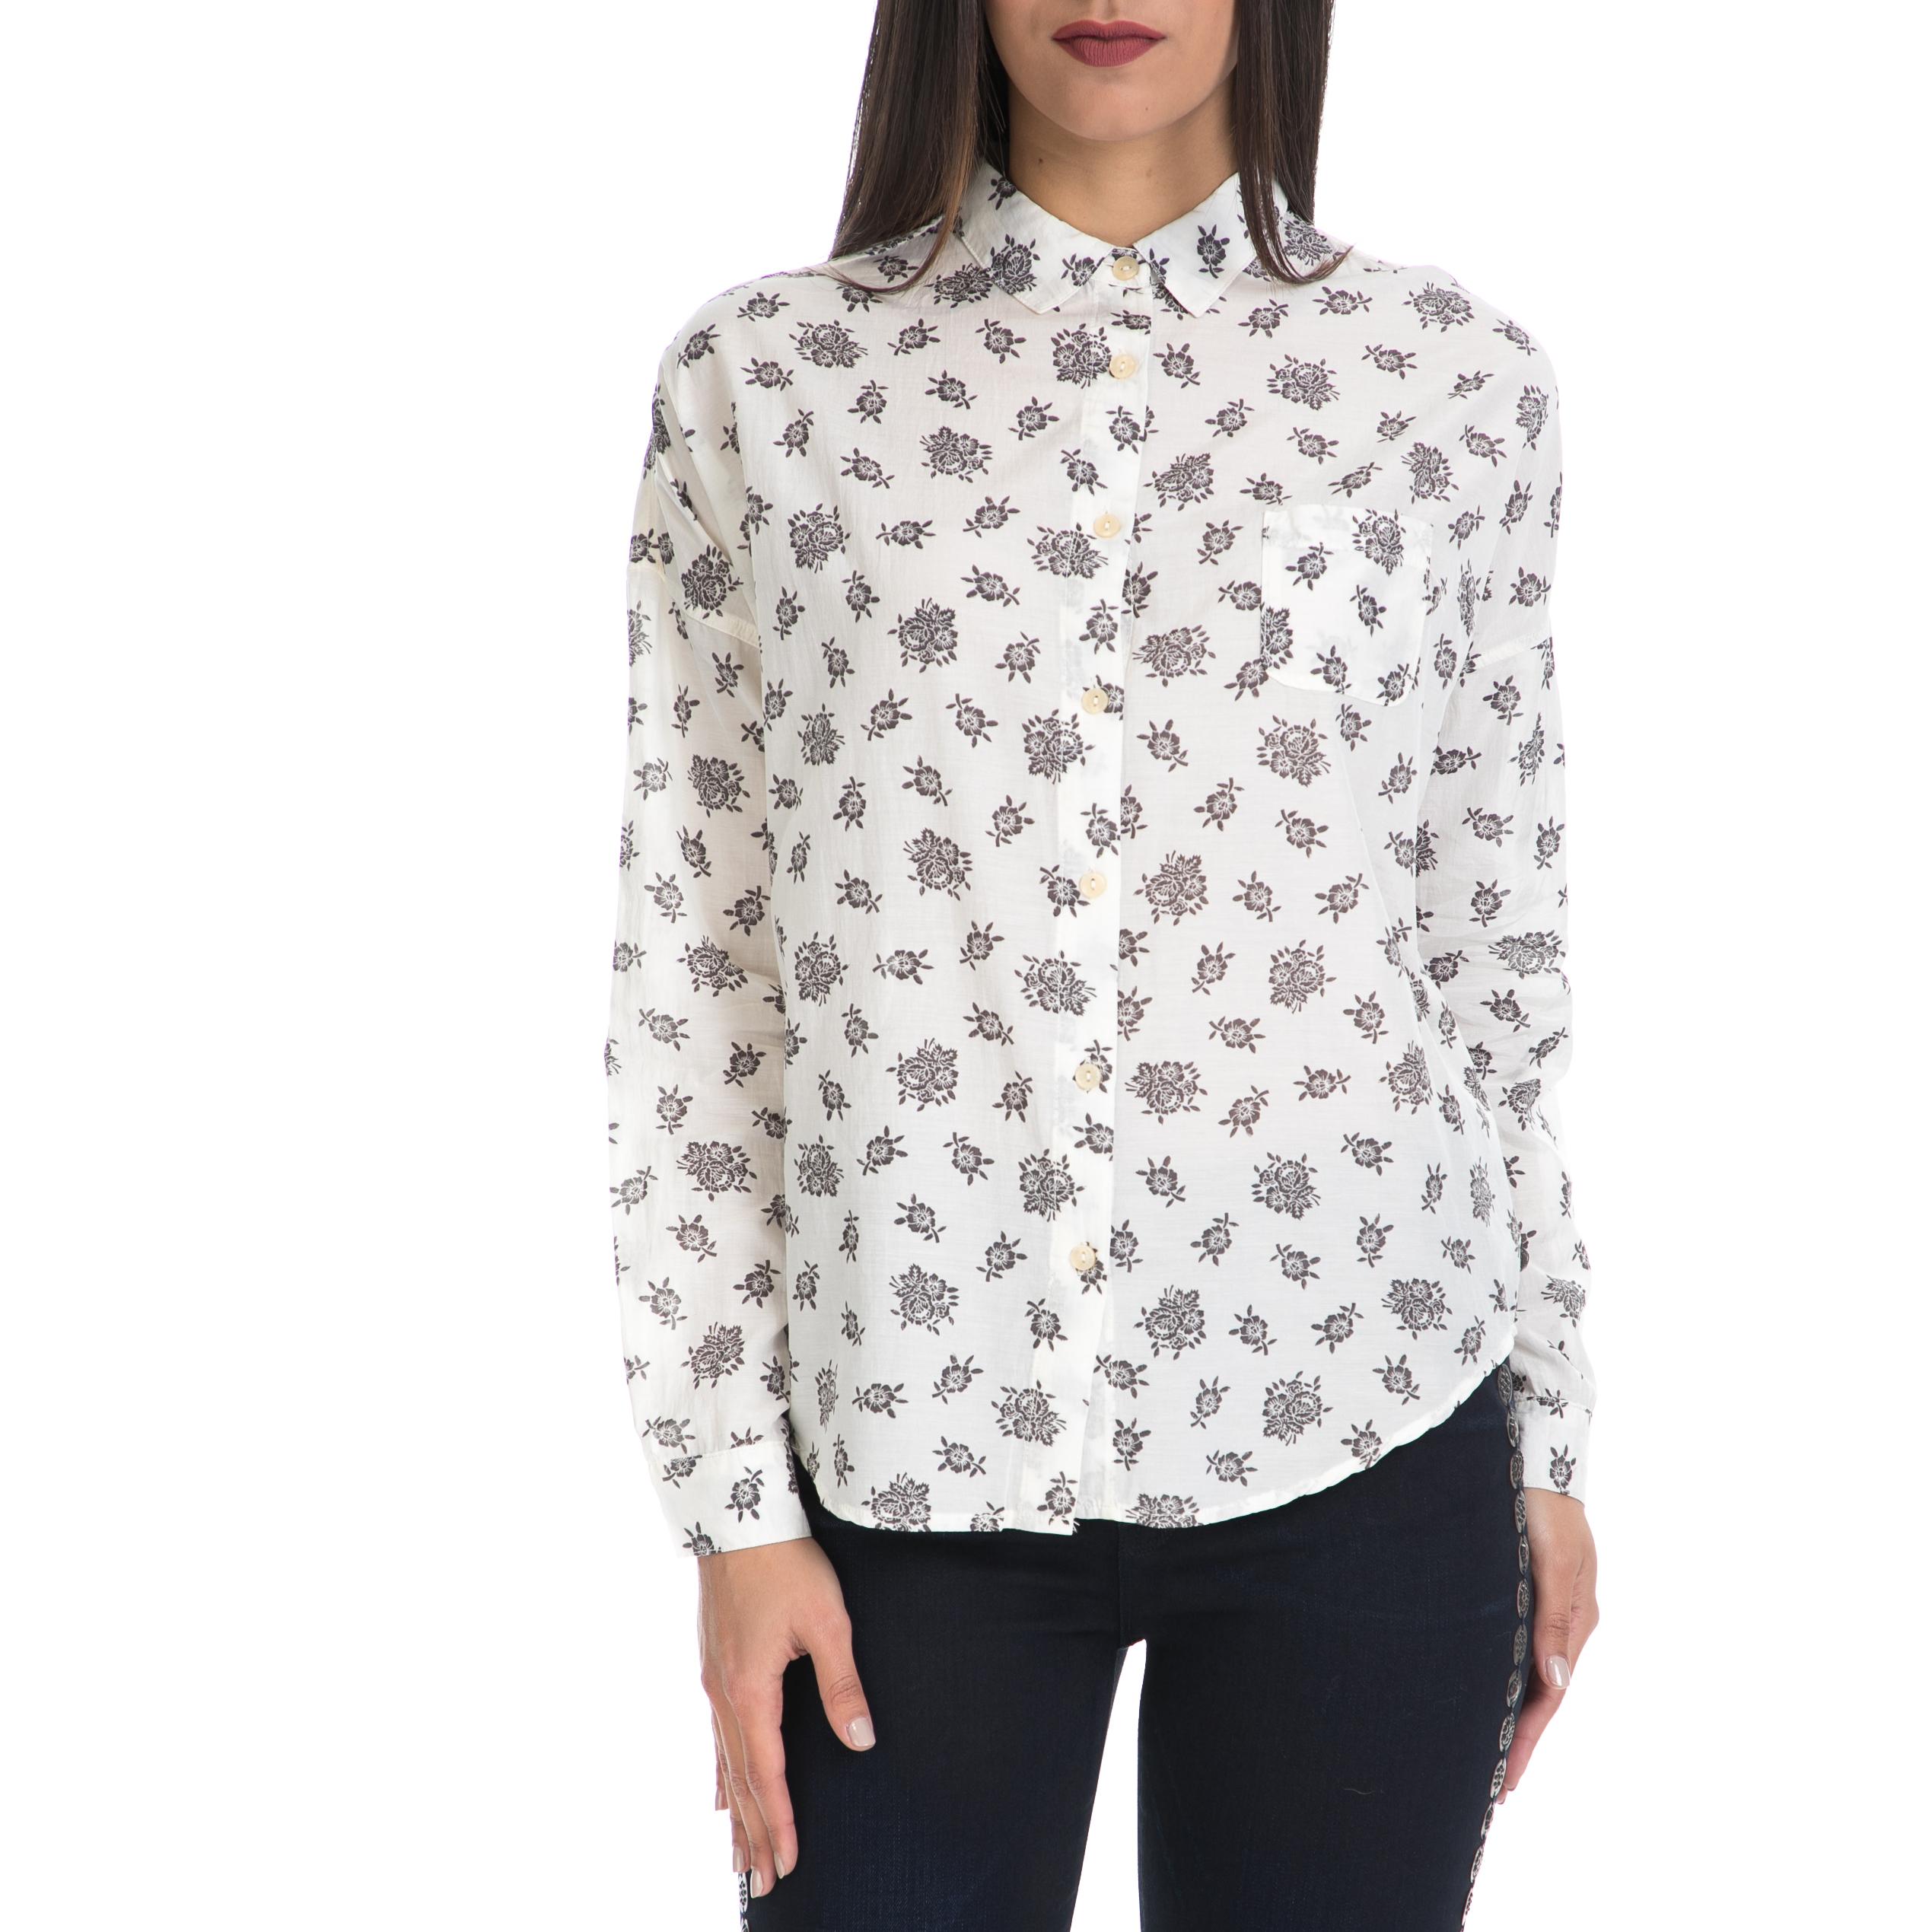 MAISON SCOTCH – Γυναικείο πουκάμισο MAISON SCOTCH λευκό-μαύρο